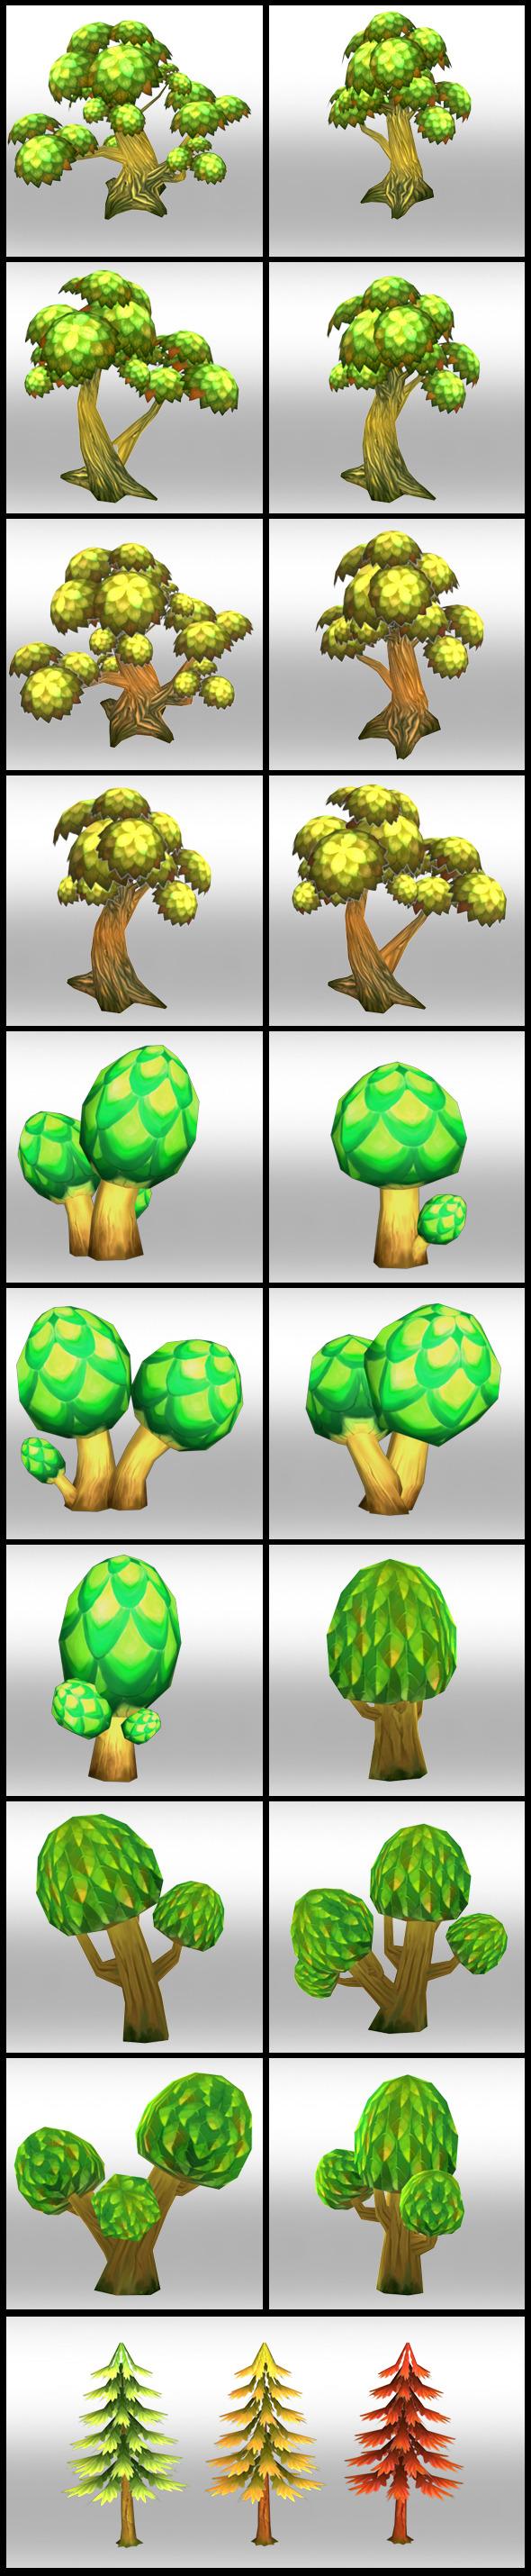 3DOcean Lowpoly Fantasy Trees pack 4298762